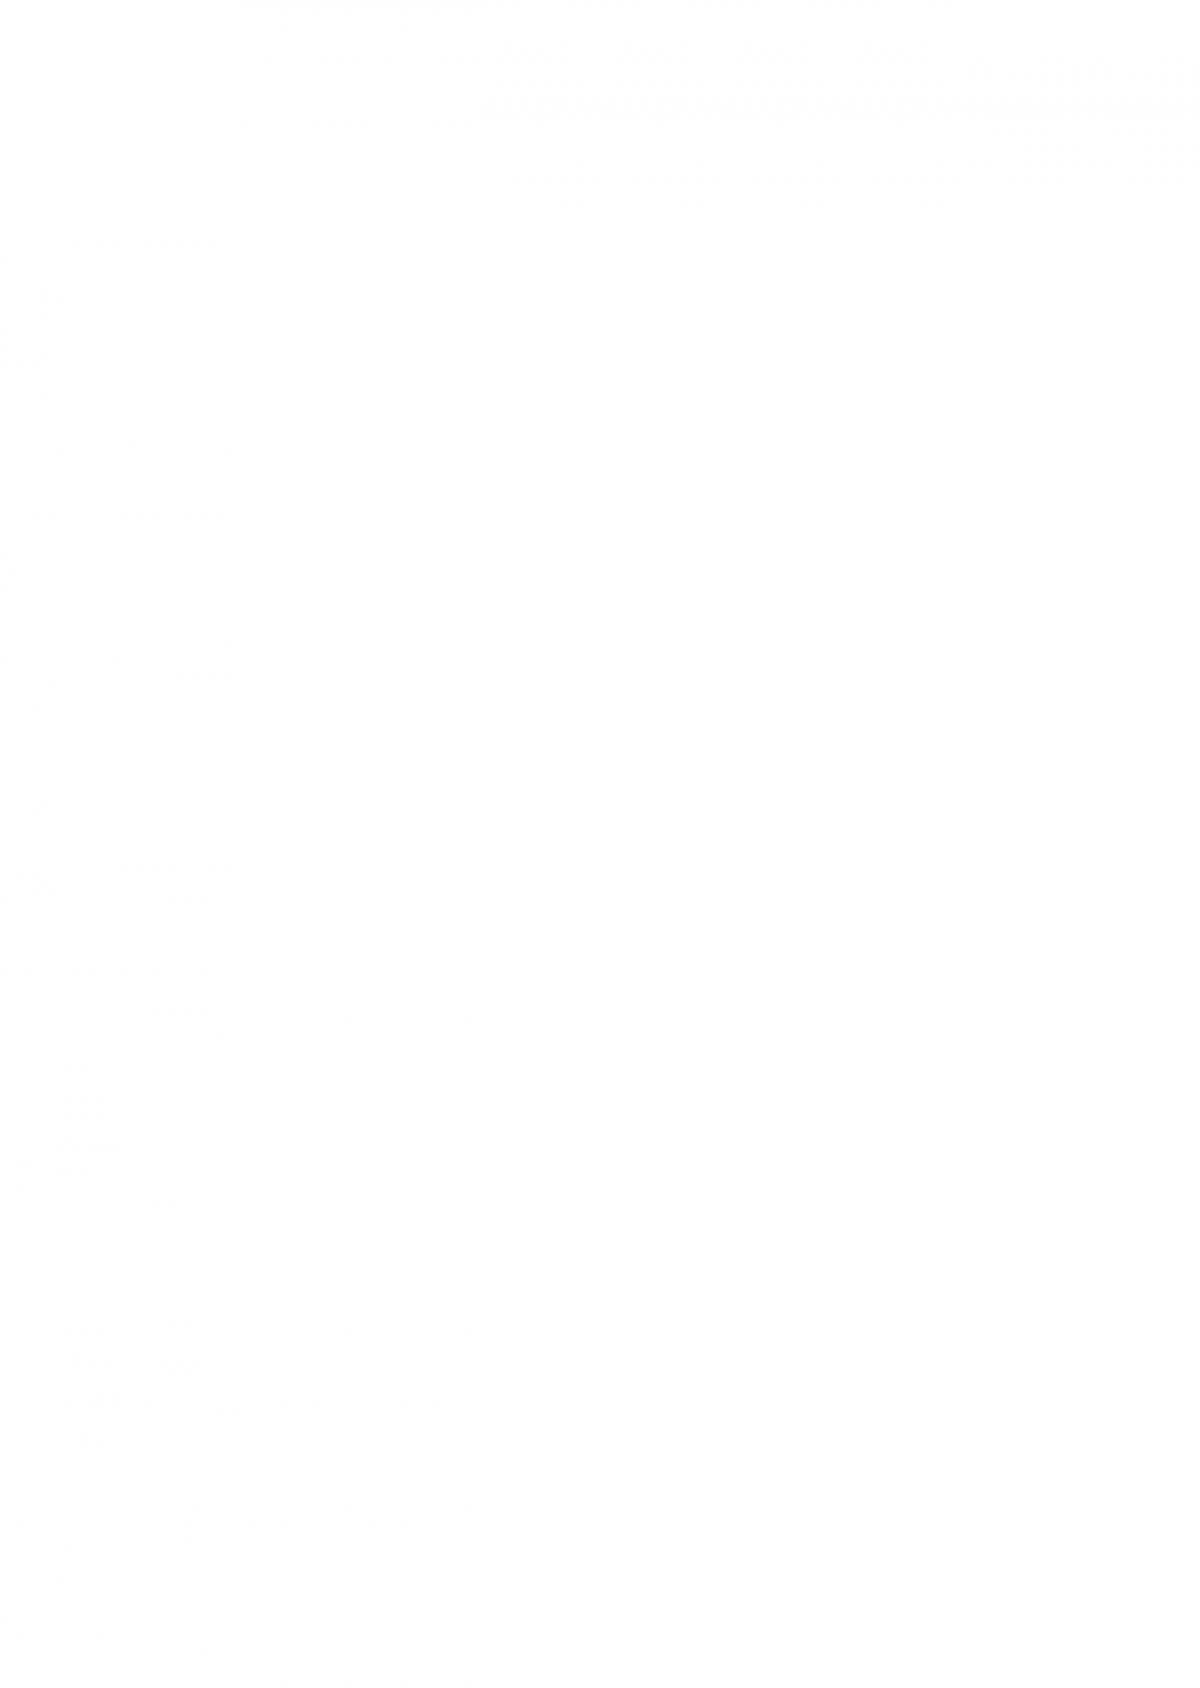 HentaiVN.net - Ảnh 4 - Shio-chan to Osoto de Asobou - Oneshot